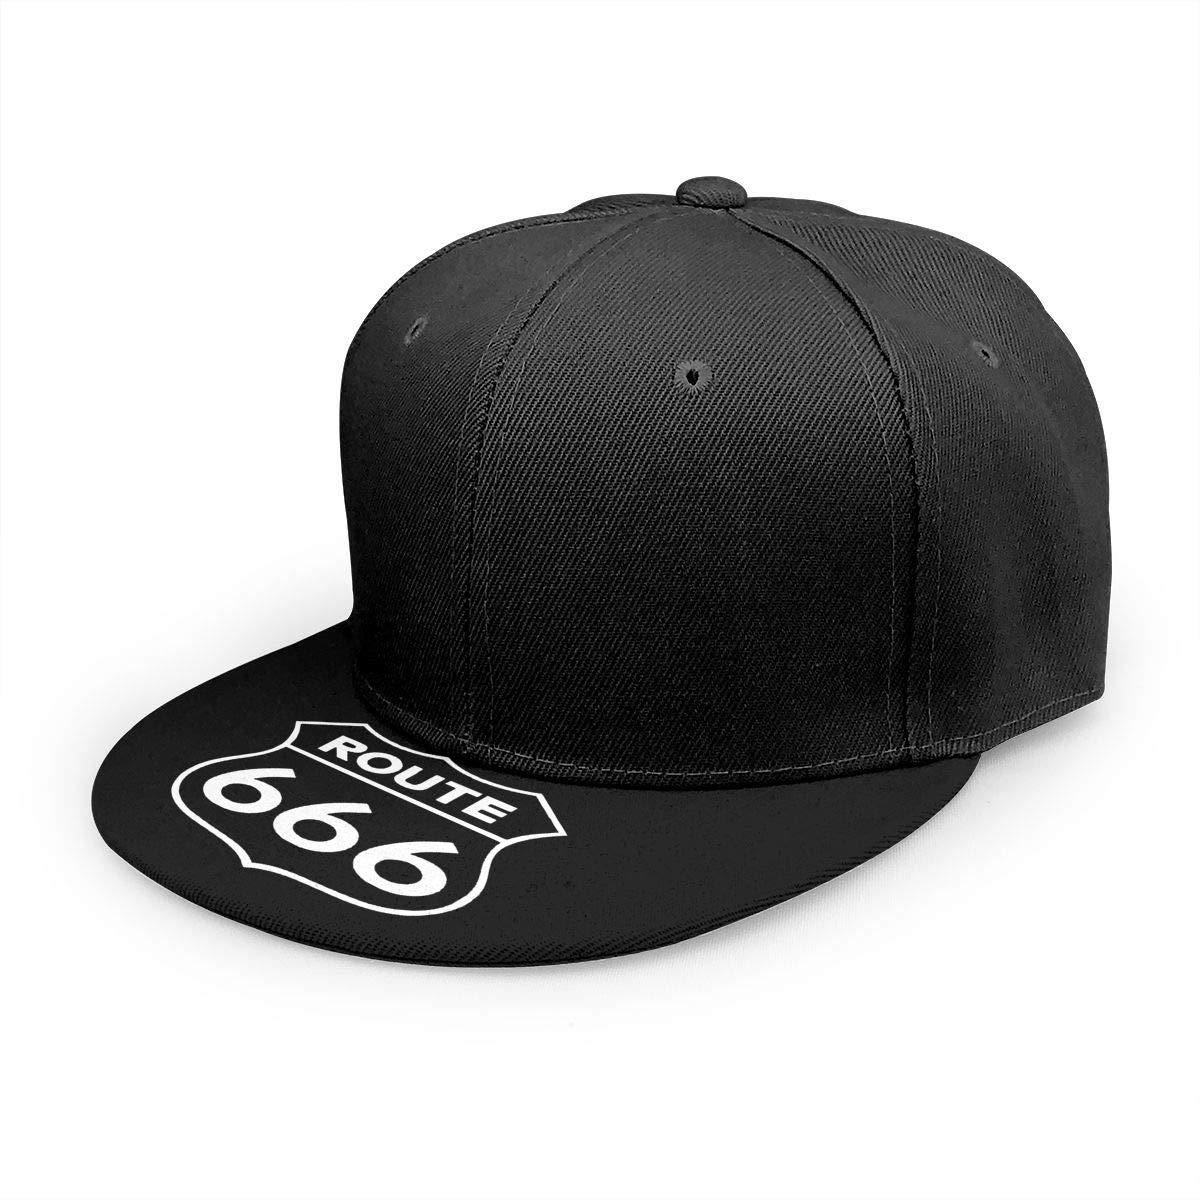 Adjustable Women Men Route 666 Print Baseball Cap Flat Brim Cap Hats Hip Hop Snapback Sun Hat Boys Girls Black by Apolonia